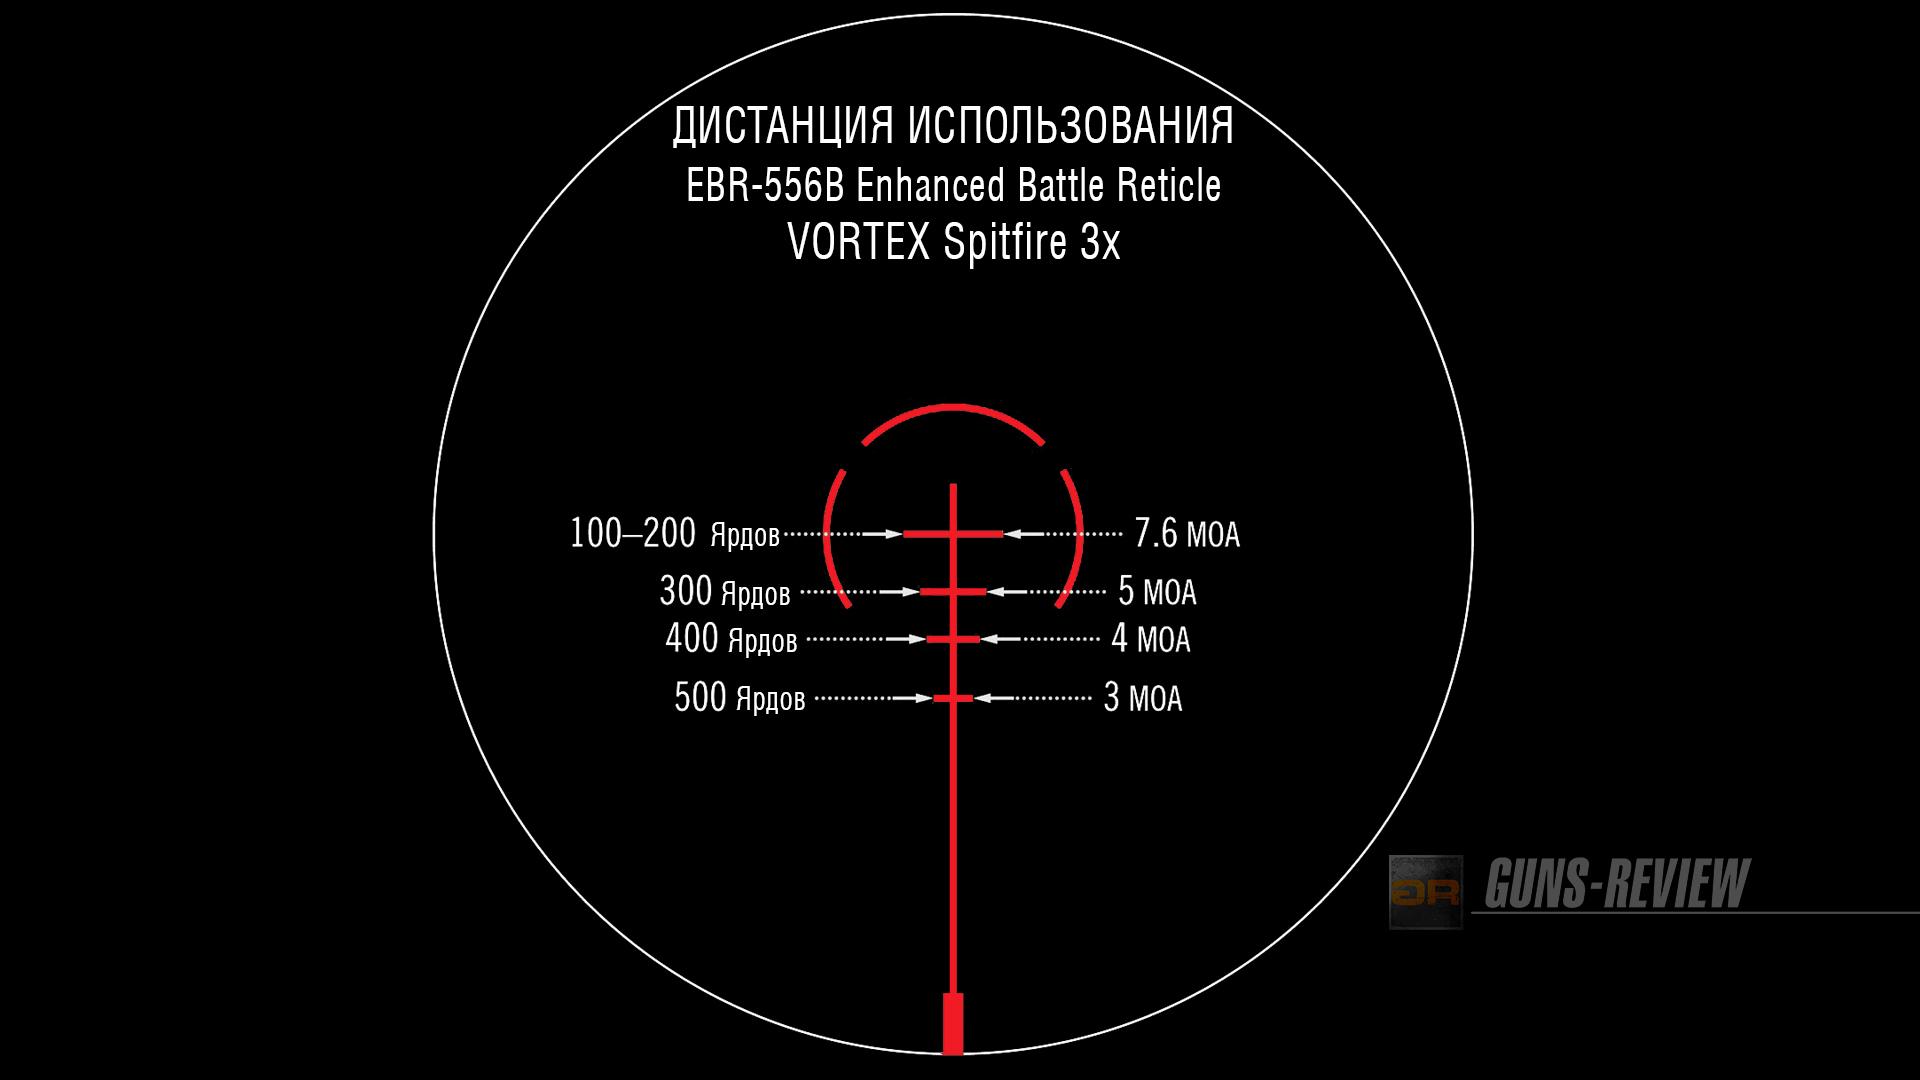 Сетка Vortex Spitfire 3x